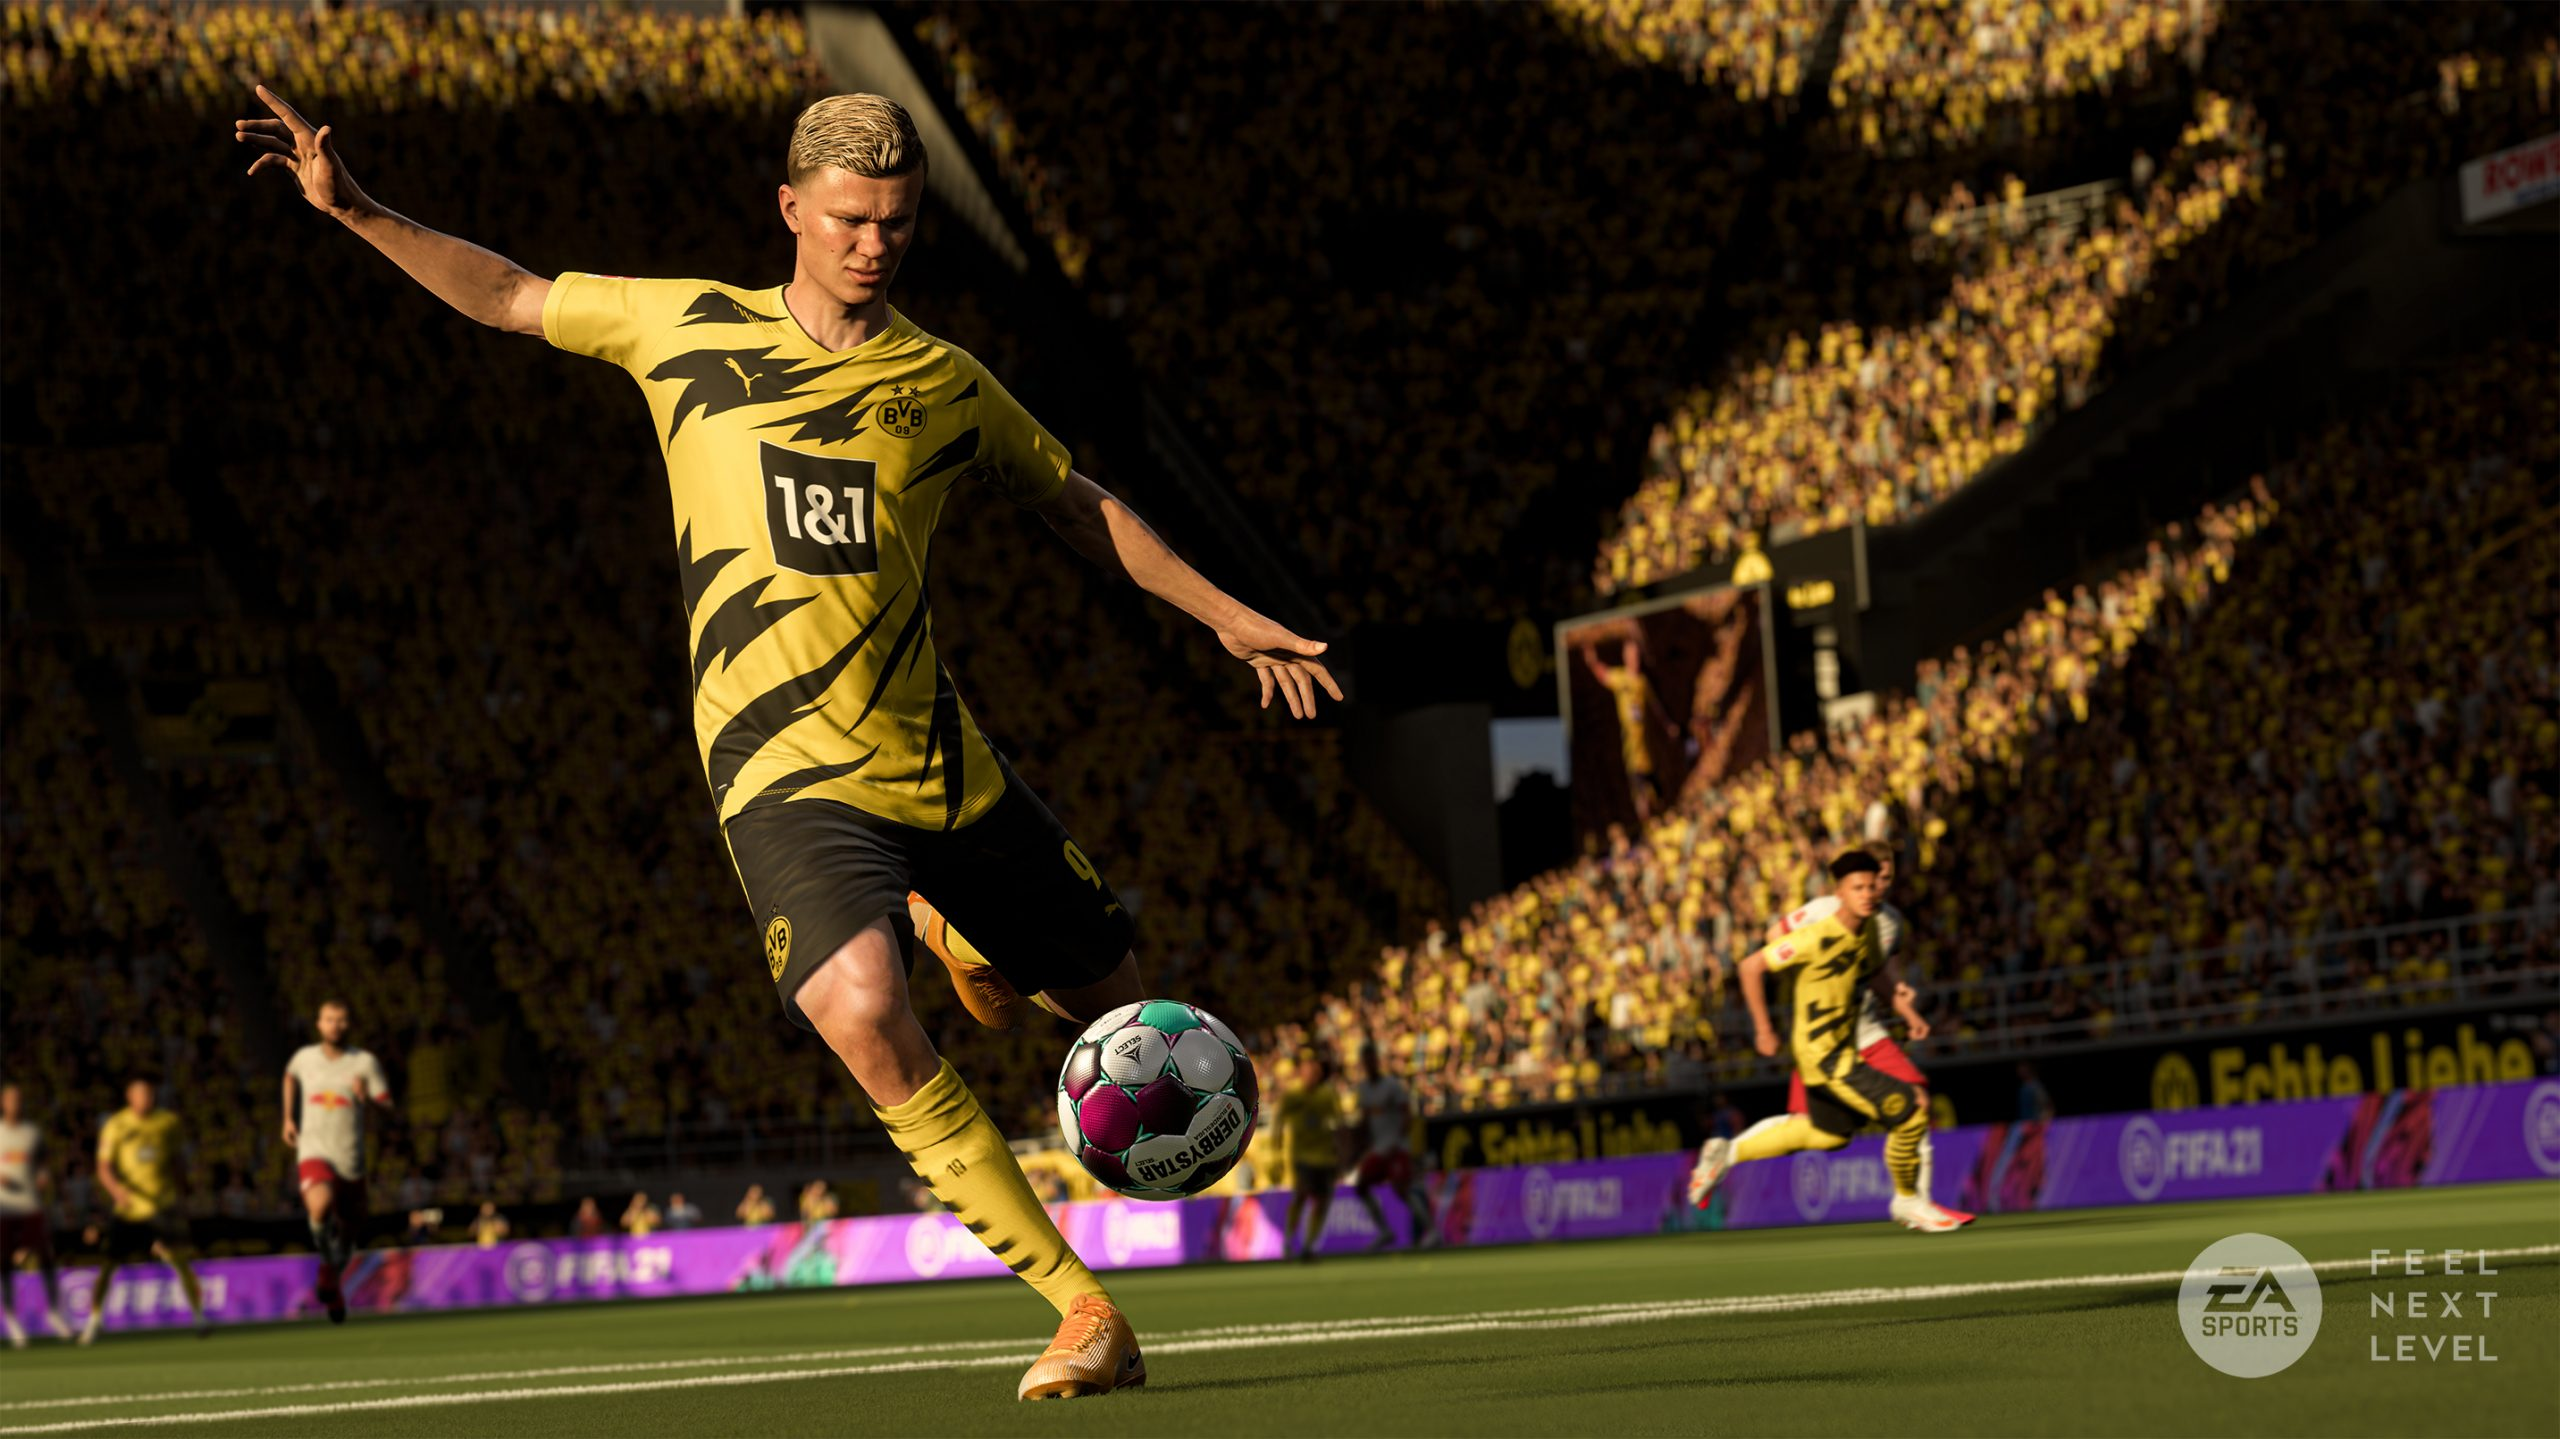 FIFA 12 HyperMotion